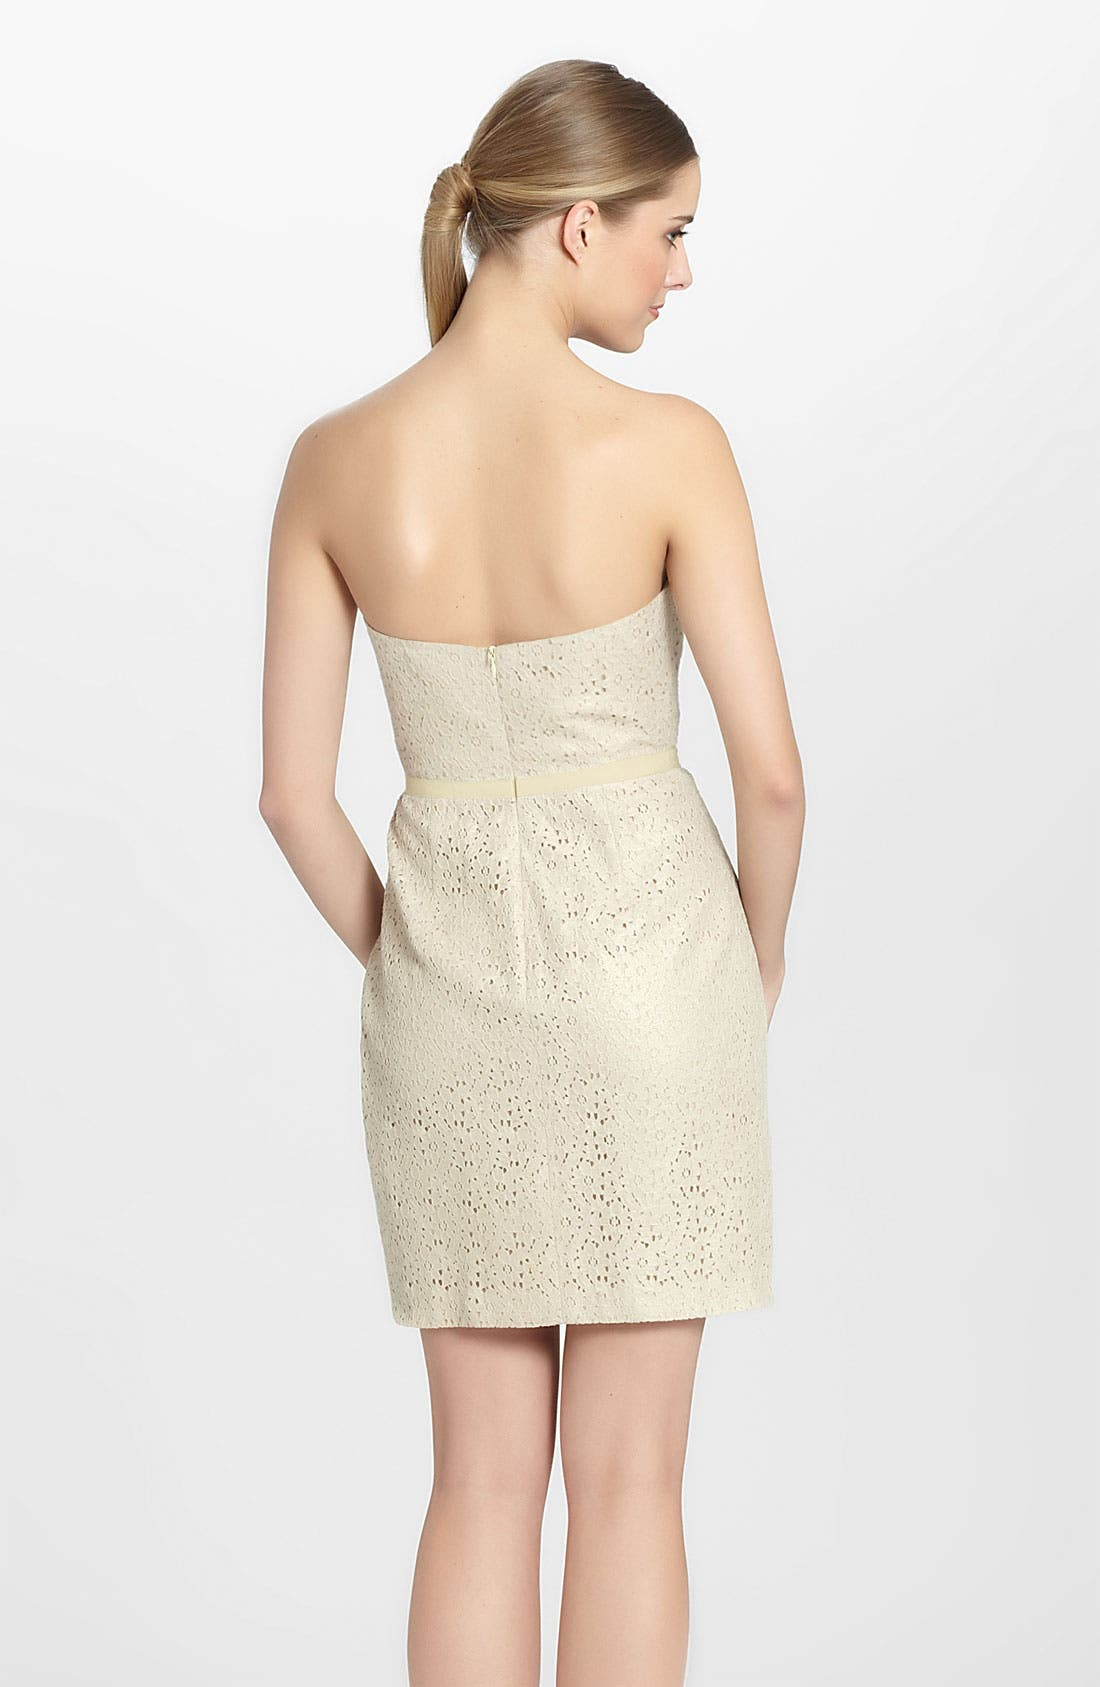 Alternate Image 2  - Seamline Cynthia Steffe 'Chloe' Foiled Lace Sheath Dress